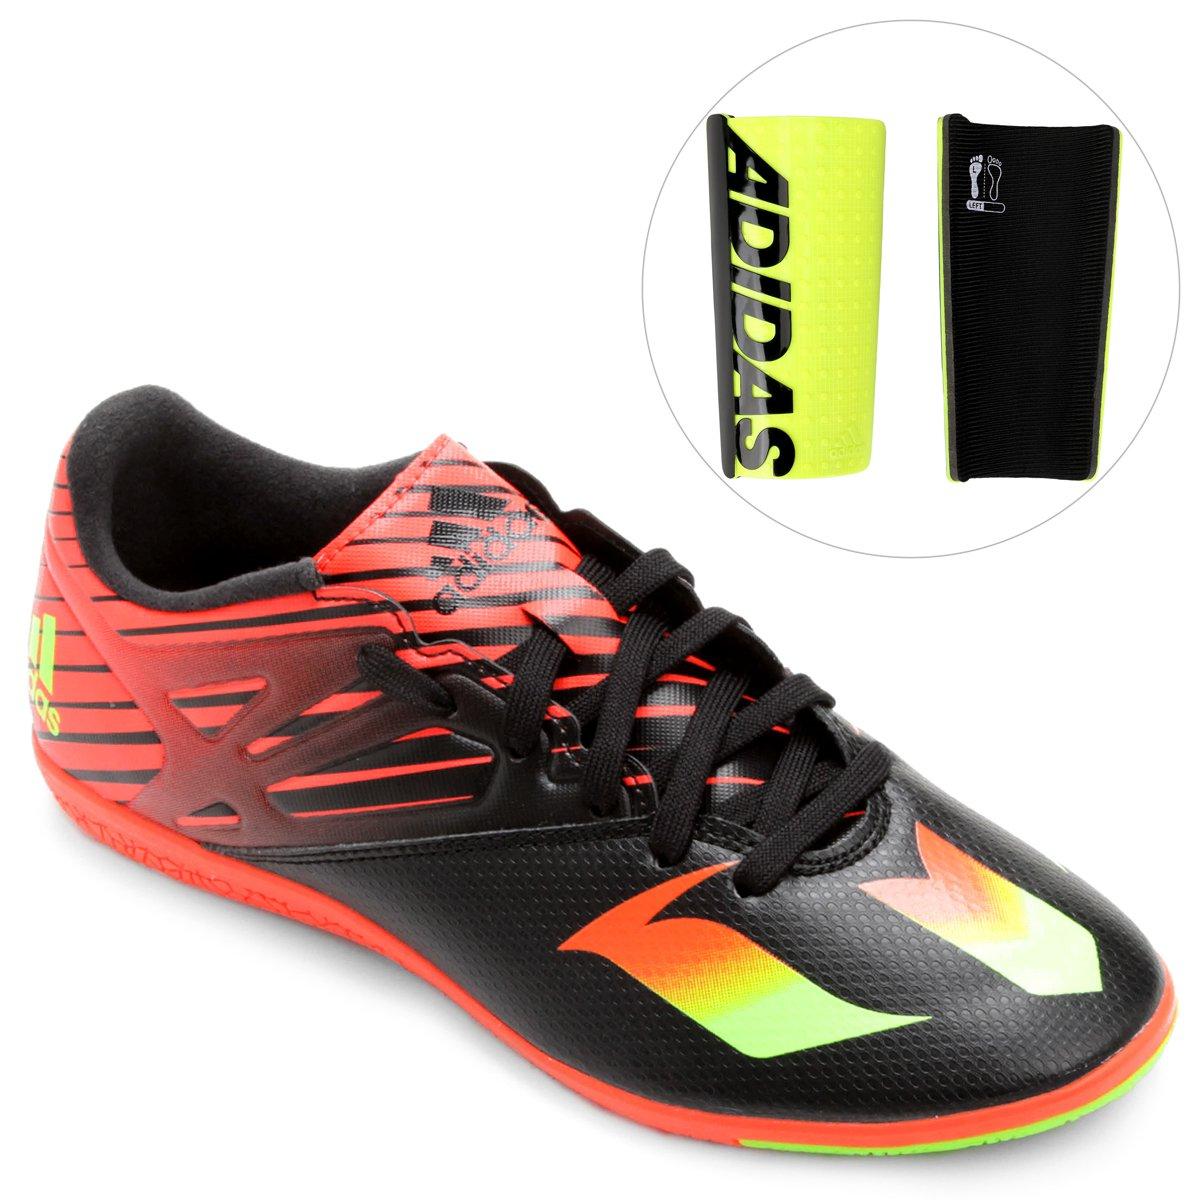 7232d6d75f Kit Chuteira Adidas Messi 15.3 IN Futsal + Caneleira Adidas Ace Lesto -  Compre Agora